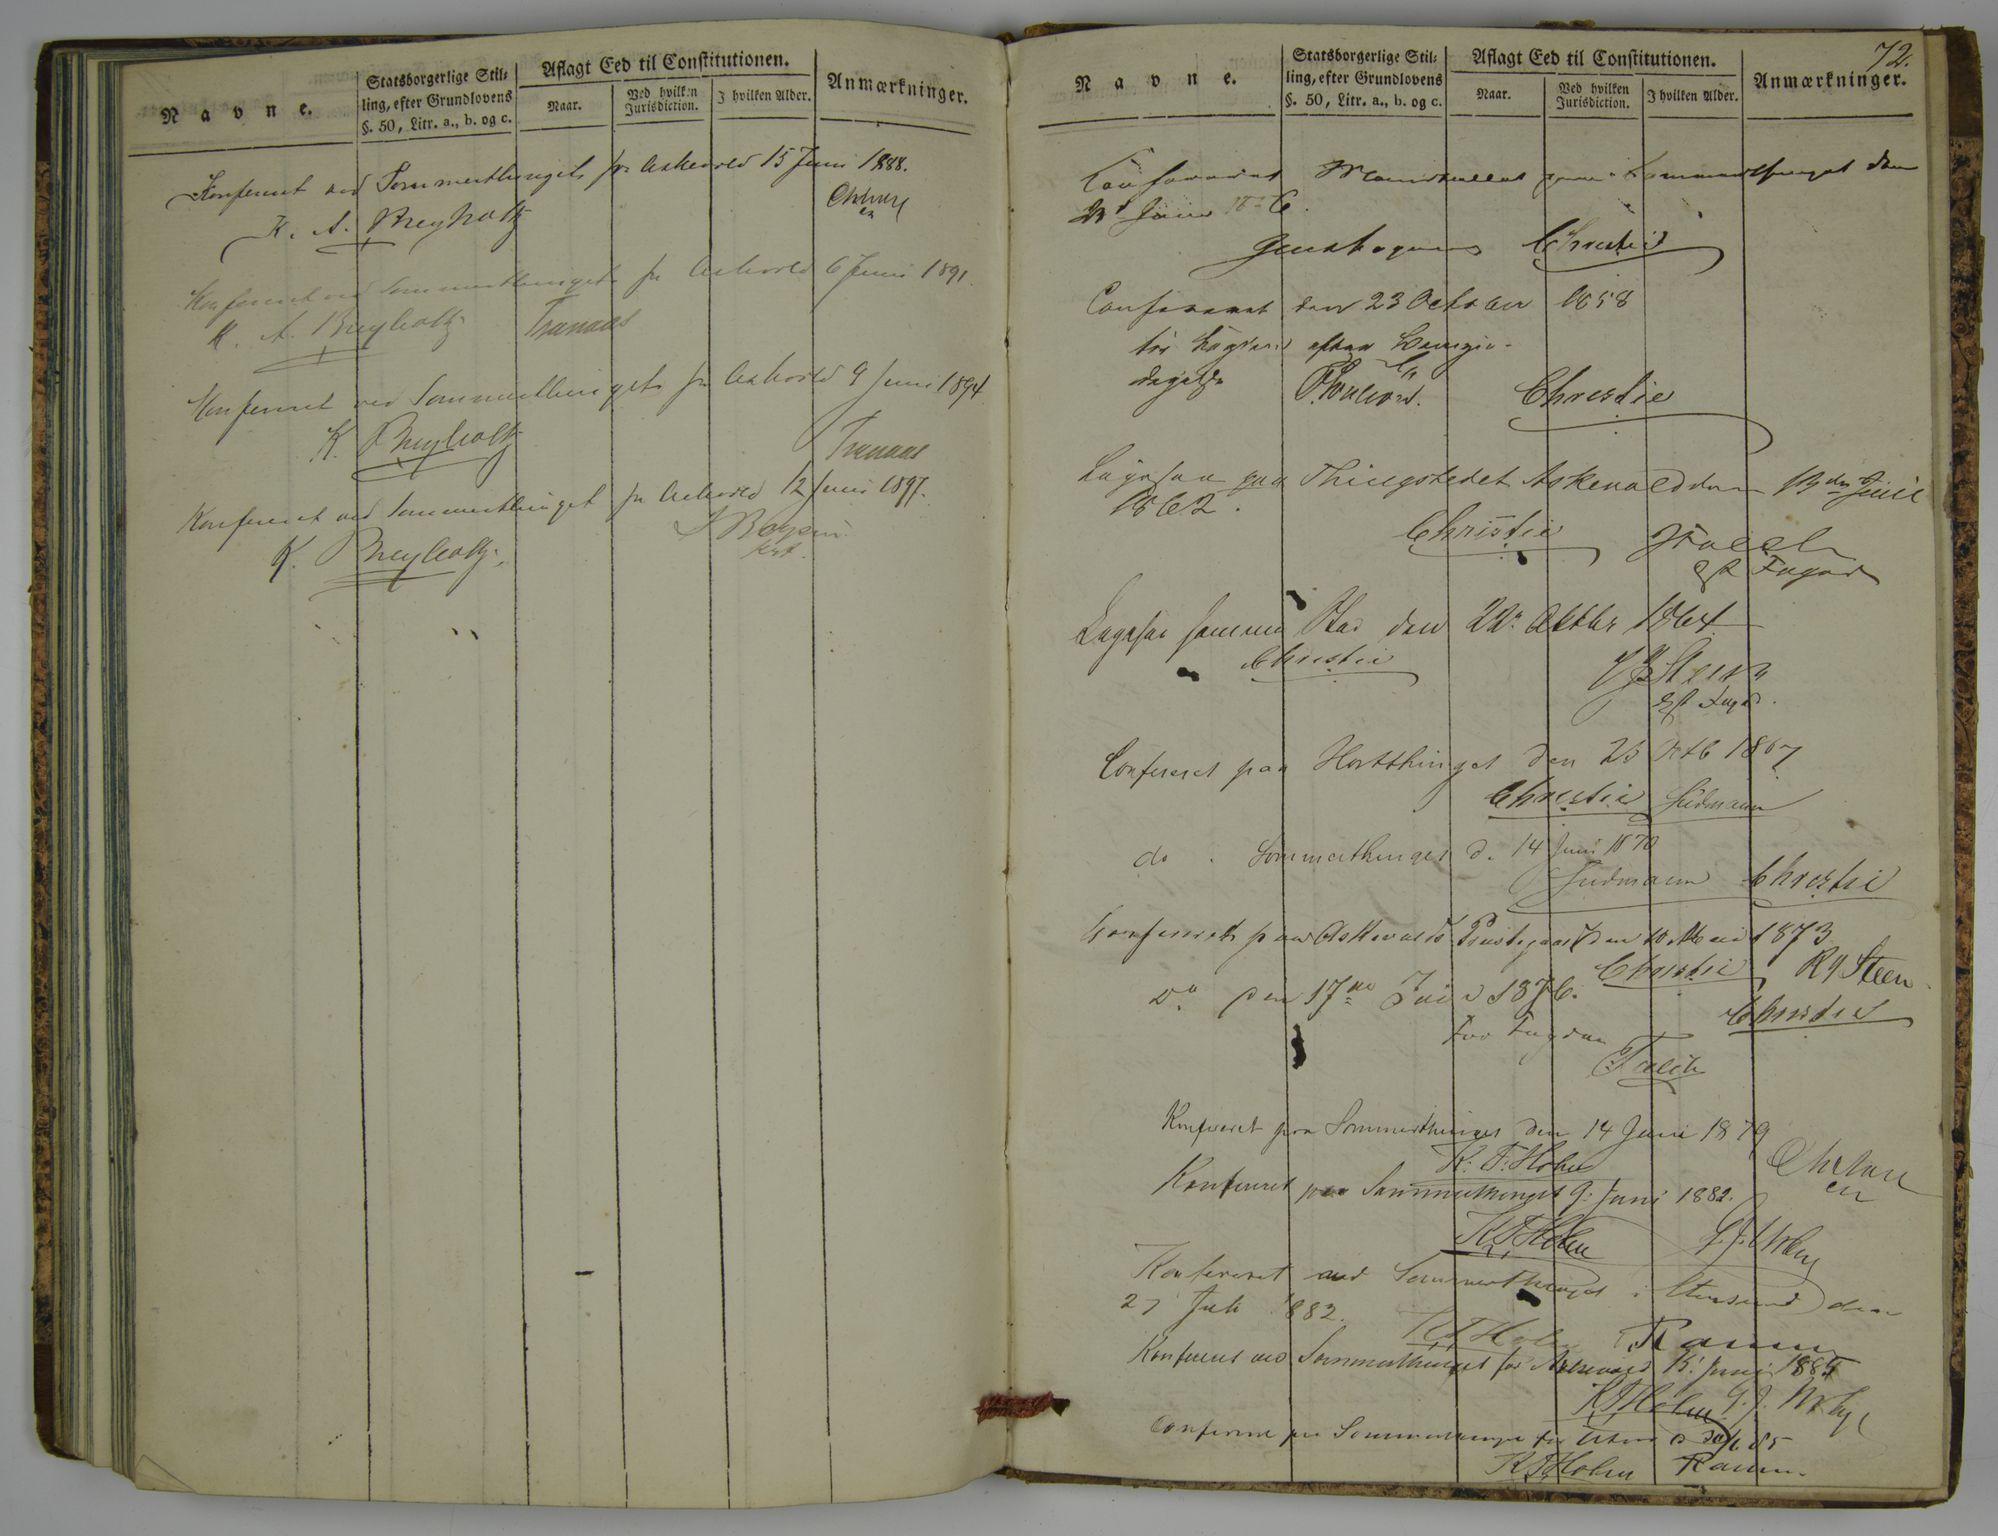 SAB, Lensmannen i Askvoll, 0004/L0001: Manntalsprotokoll, 1829-1897, s. 71b-72a